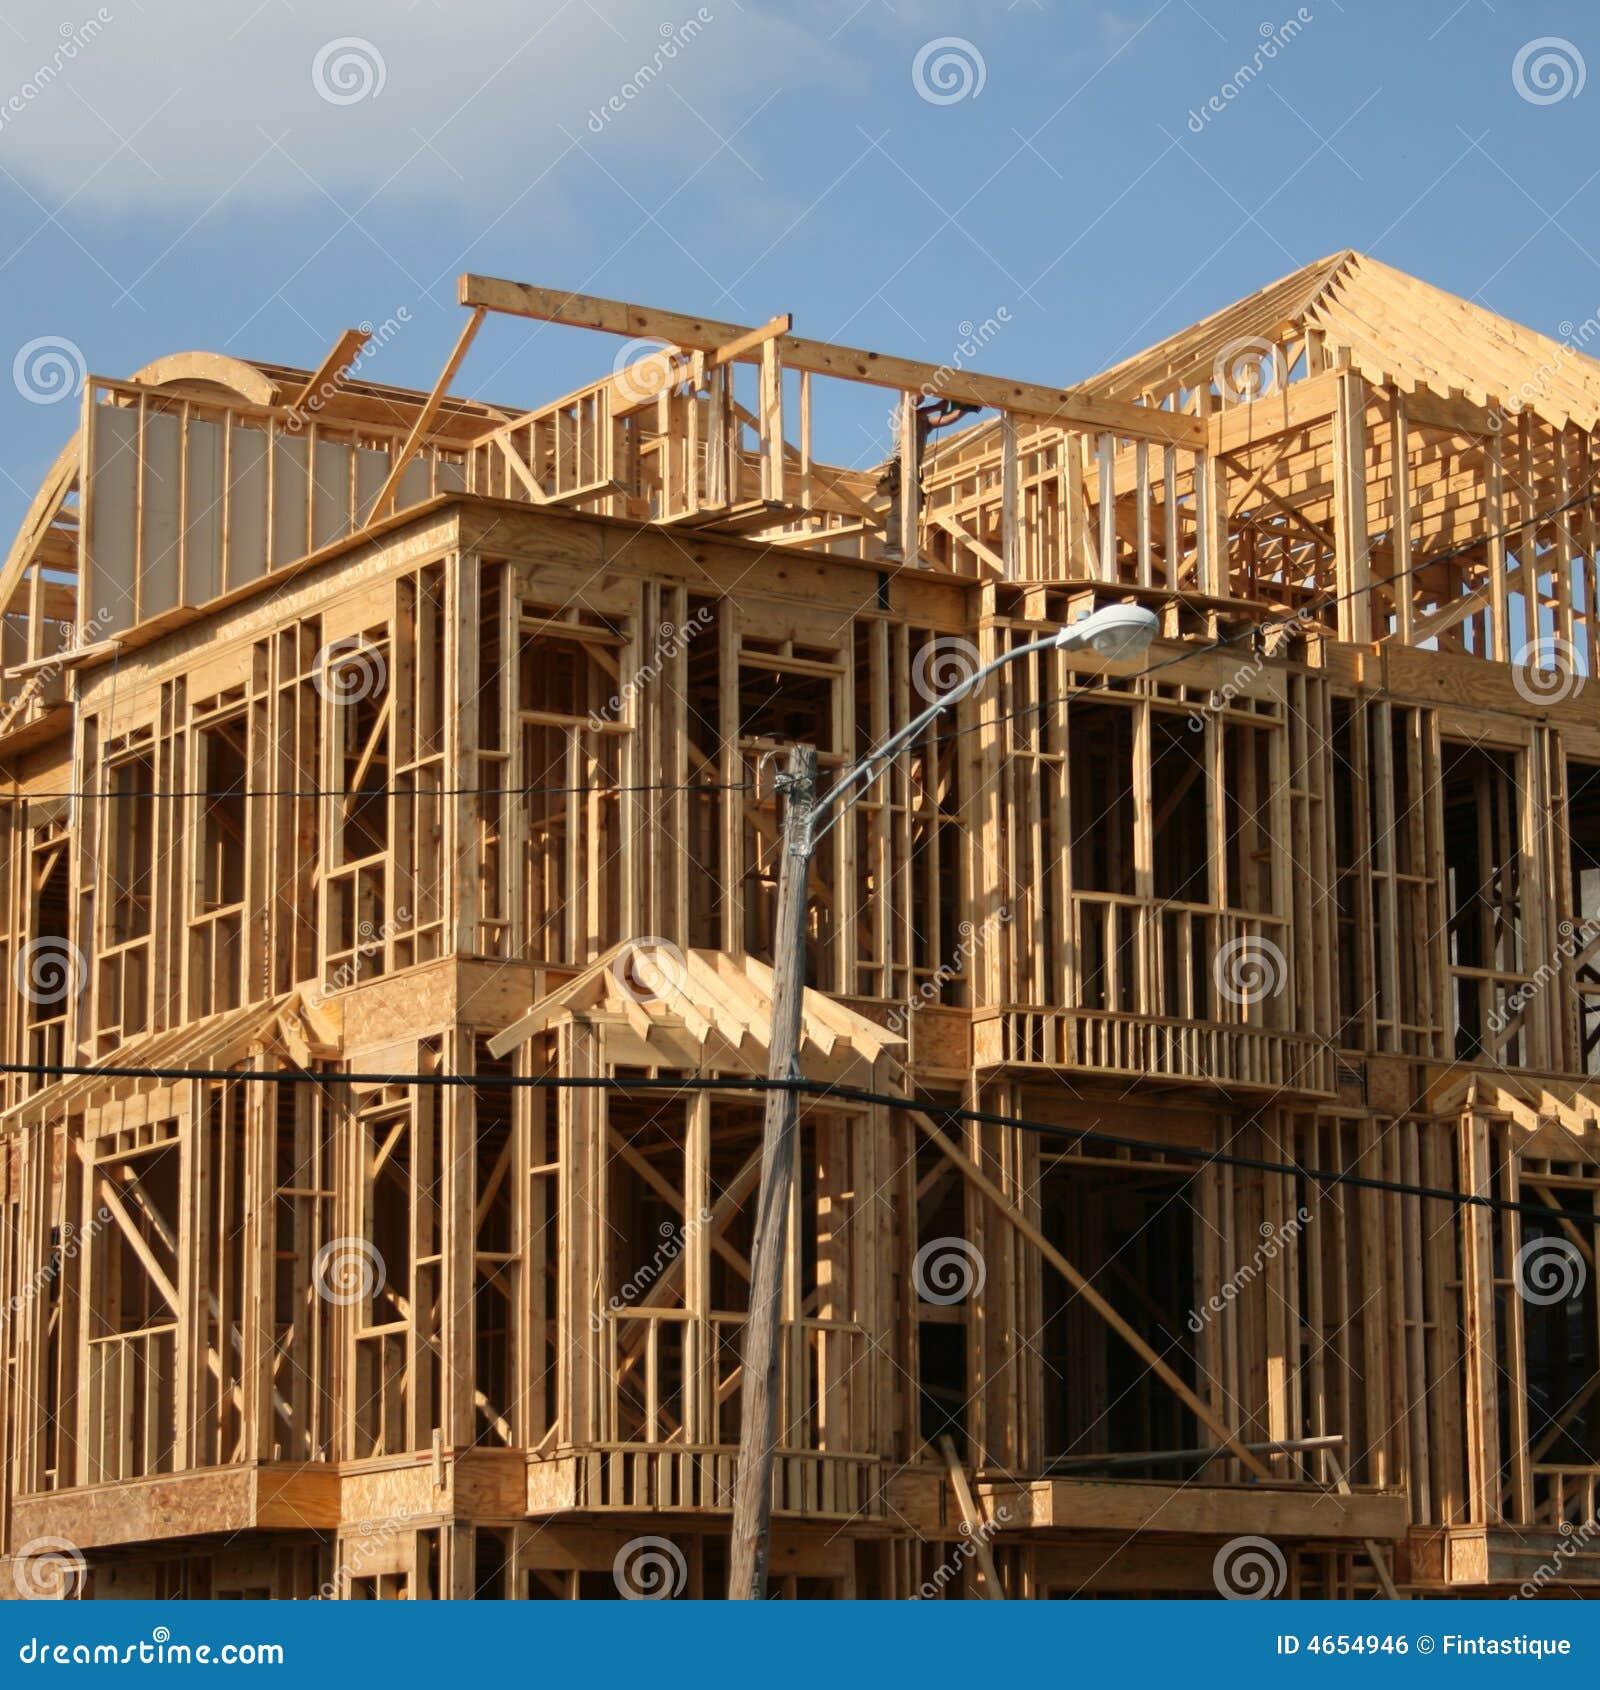 Royalty free stock image wood framed house